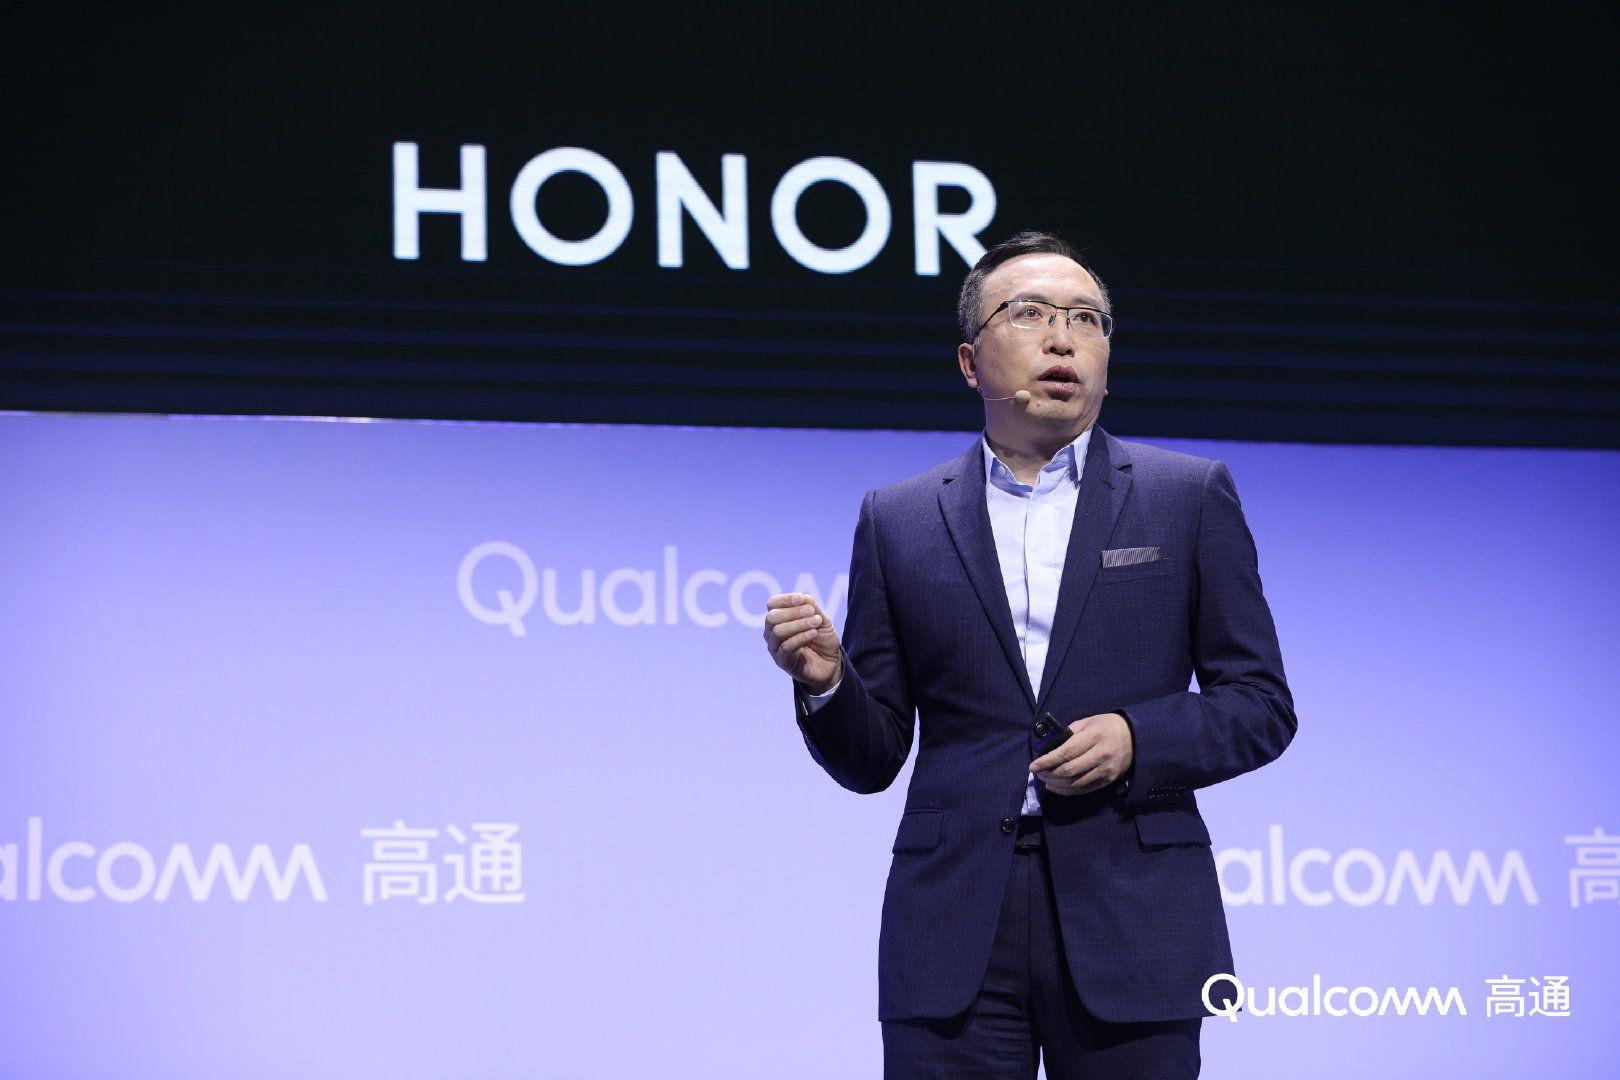 HONOR CEO、HarmonyOS採用に対し「業界の発展に基づいて適切に選択」